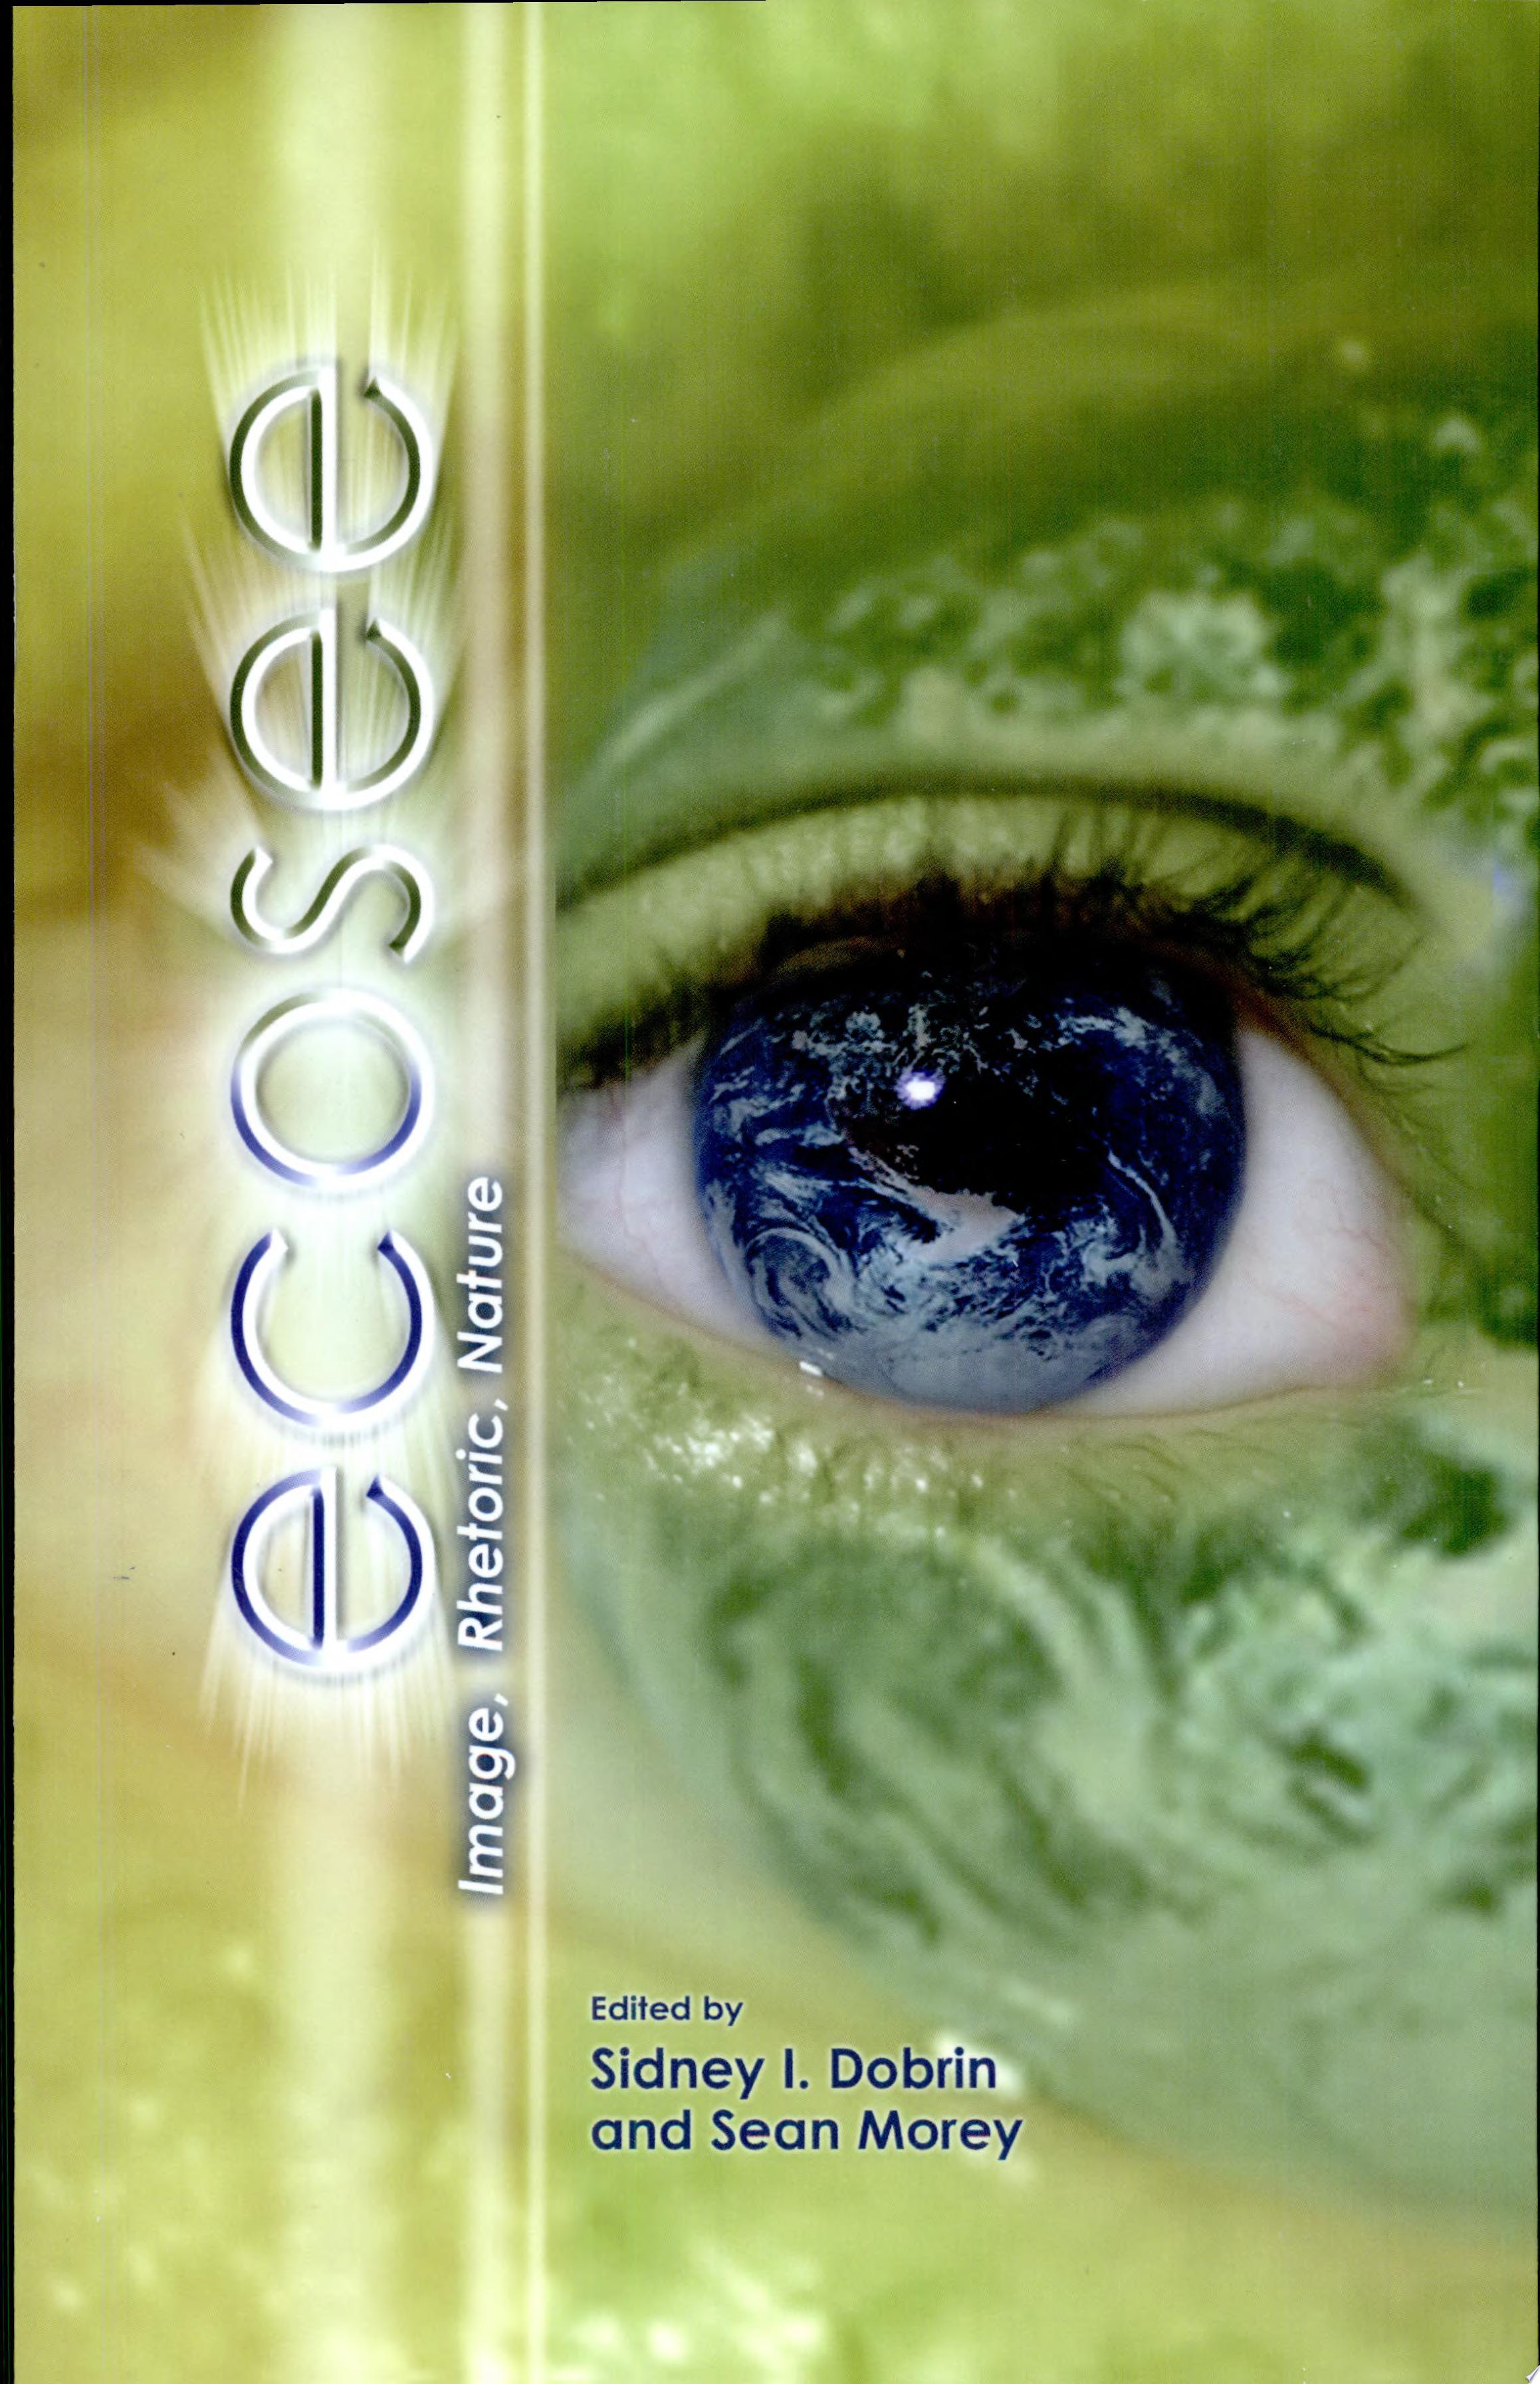 Ecosee